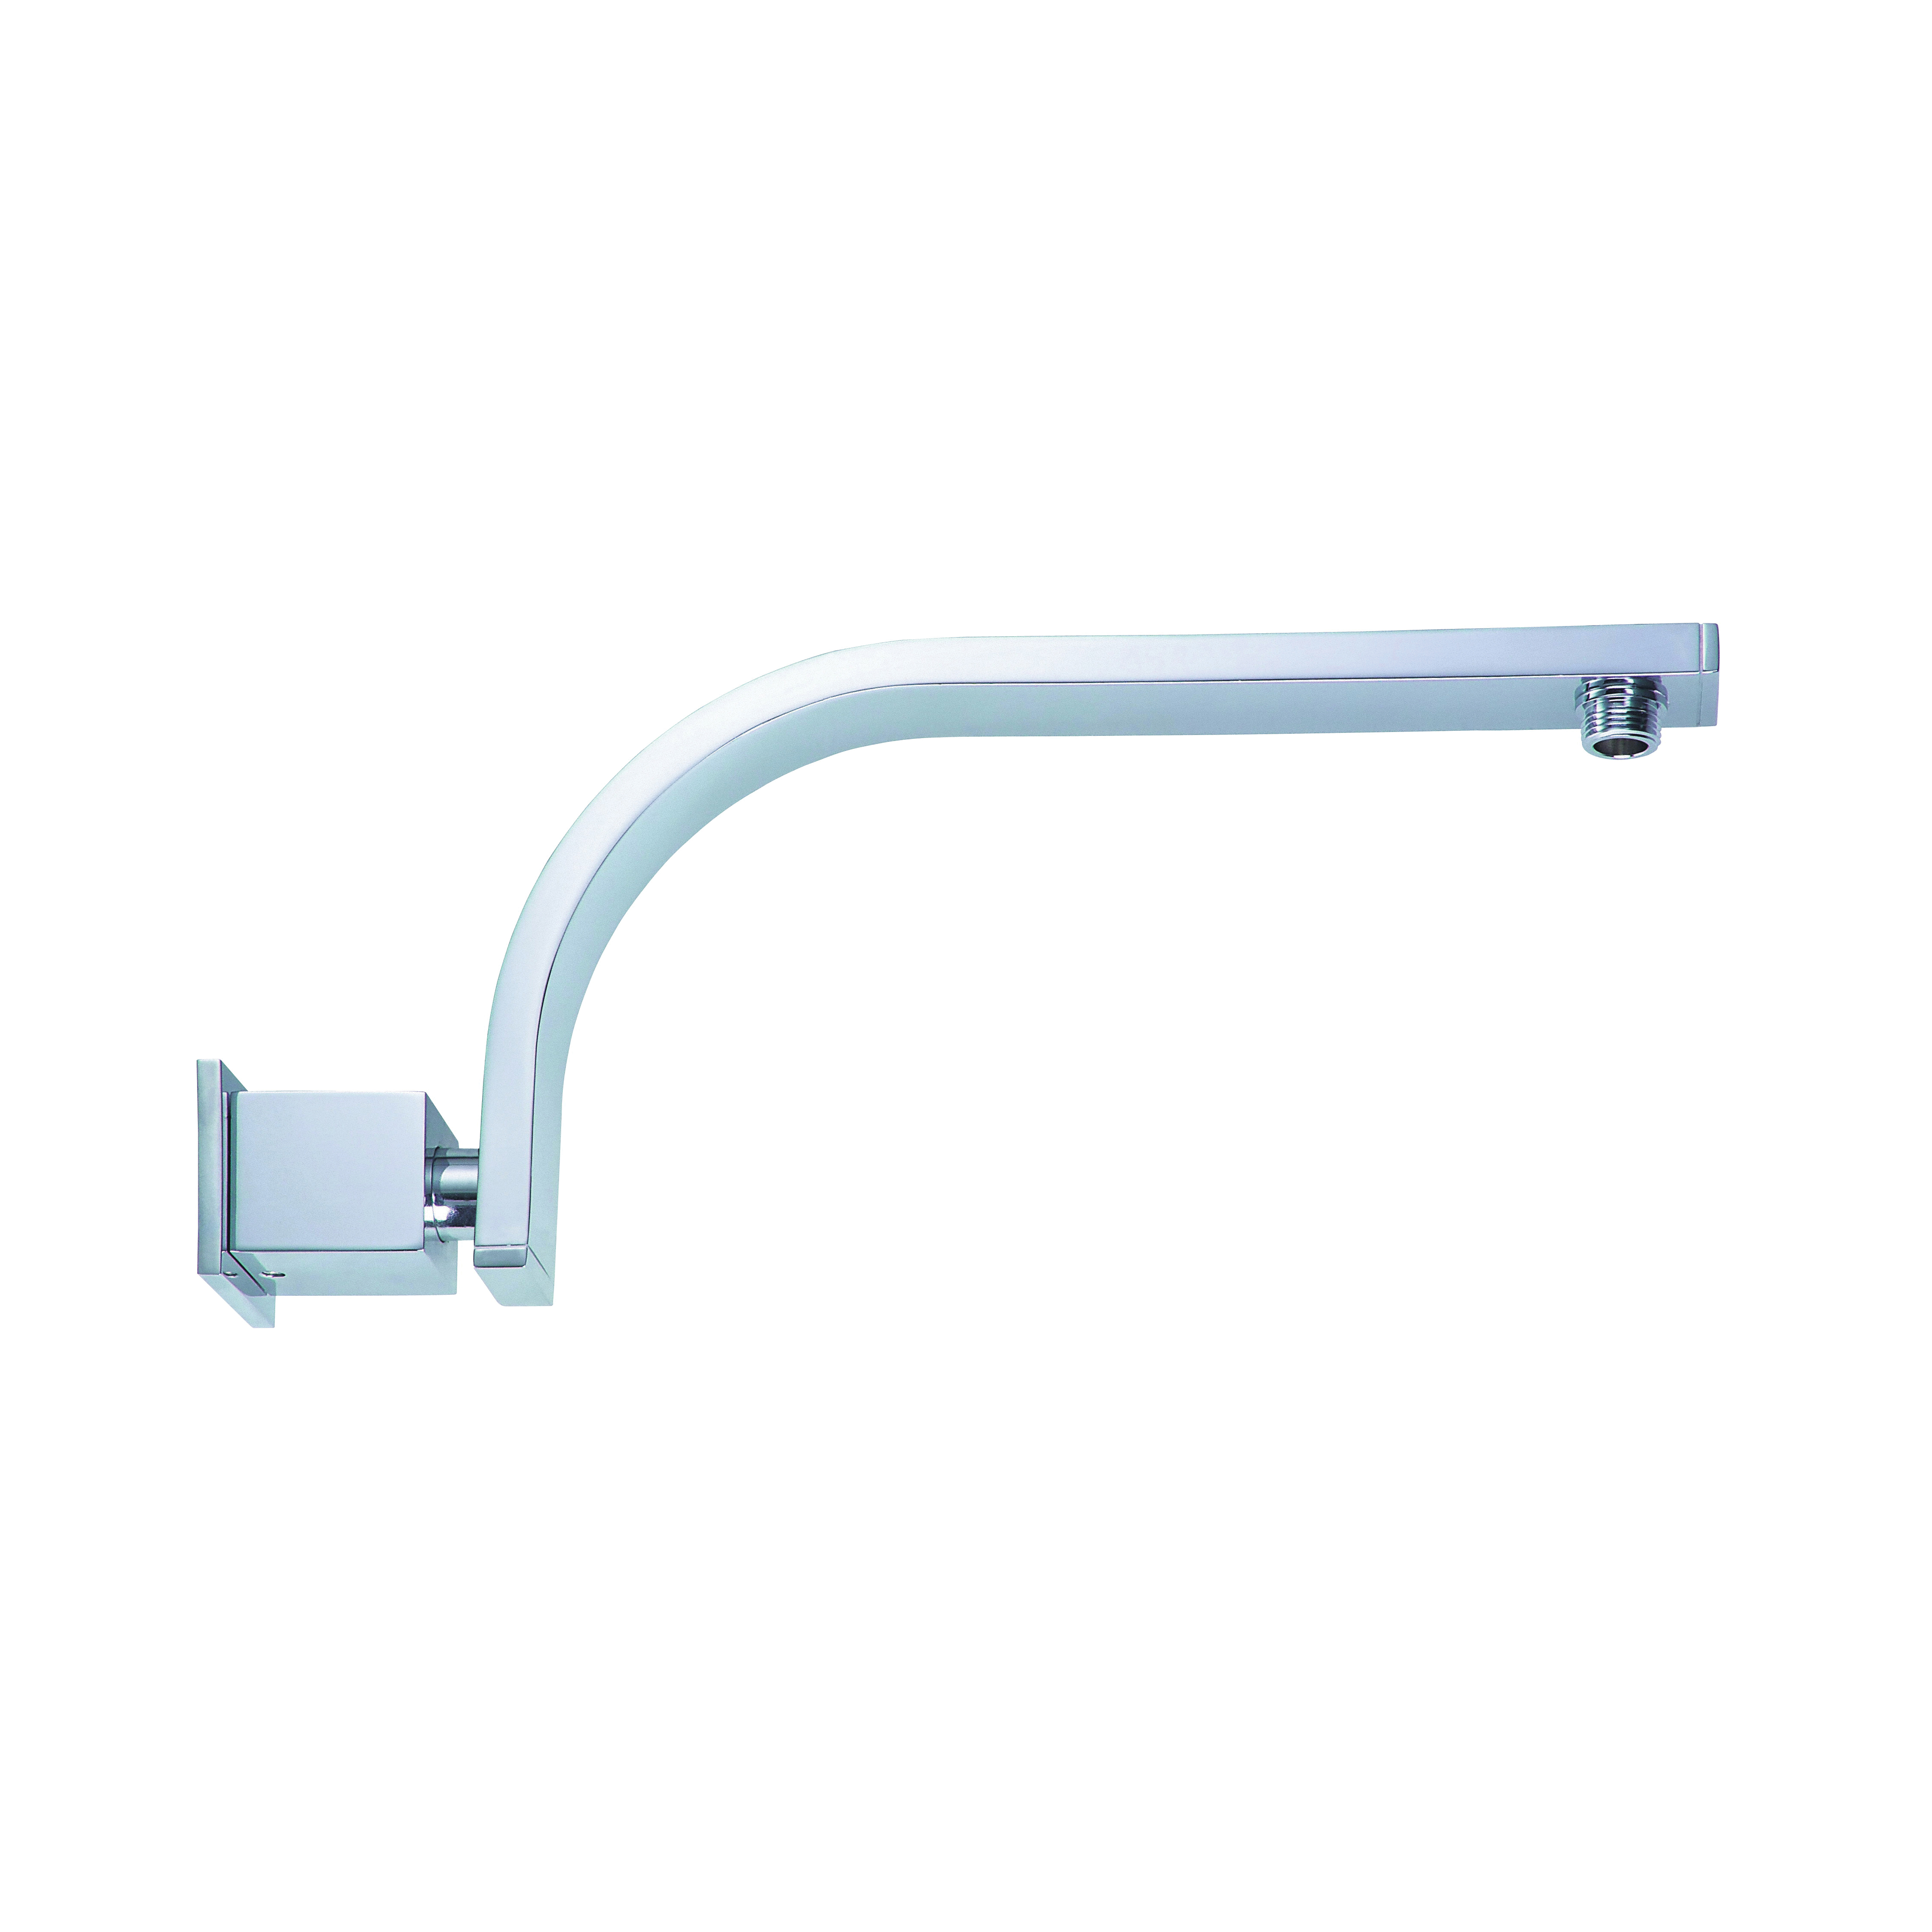 Danze® D481144 Sirius® Shower Arm With Escutcheon, 15 in L Brass Arm, 1/2-14 NPSM